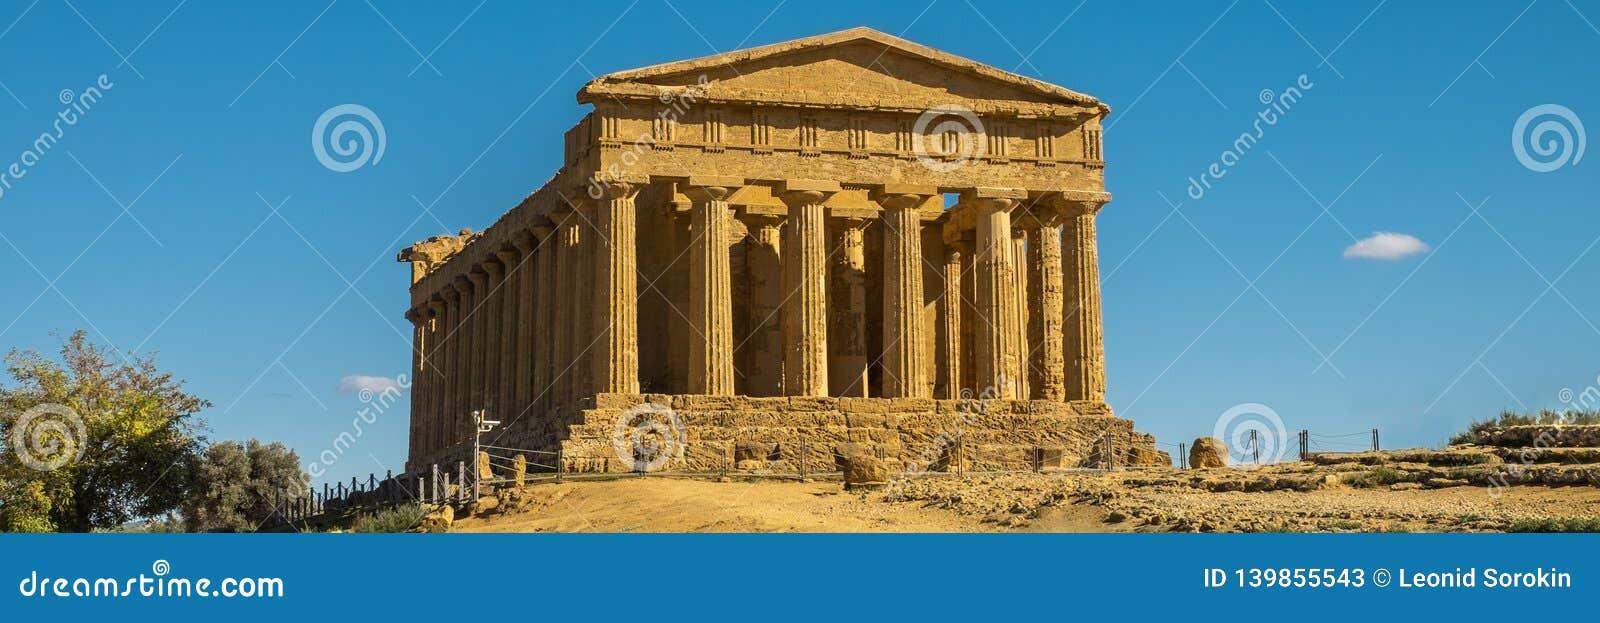 Temple grec - le temple de Concordia Agrigente, île de la Sicile en Italie